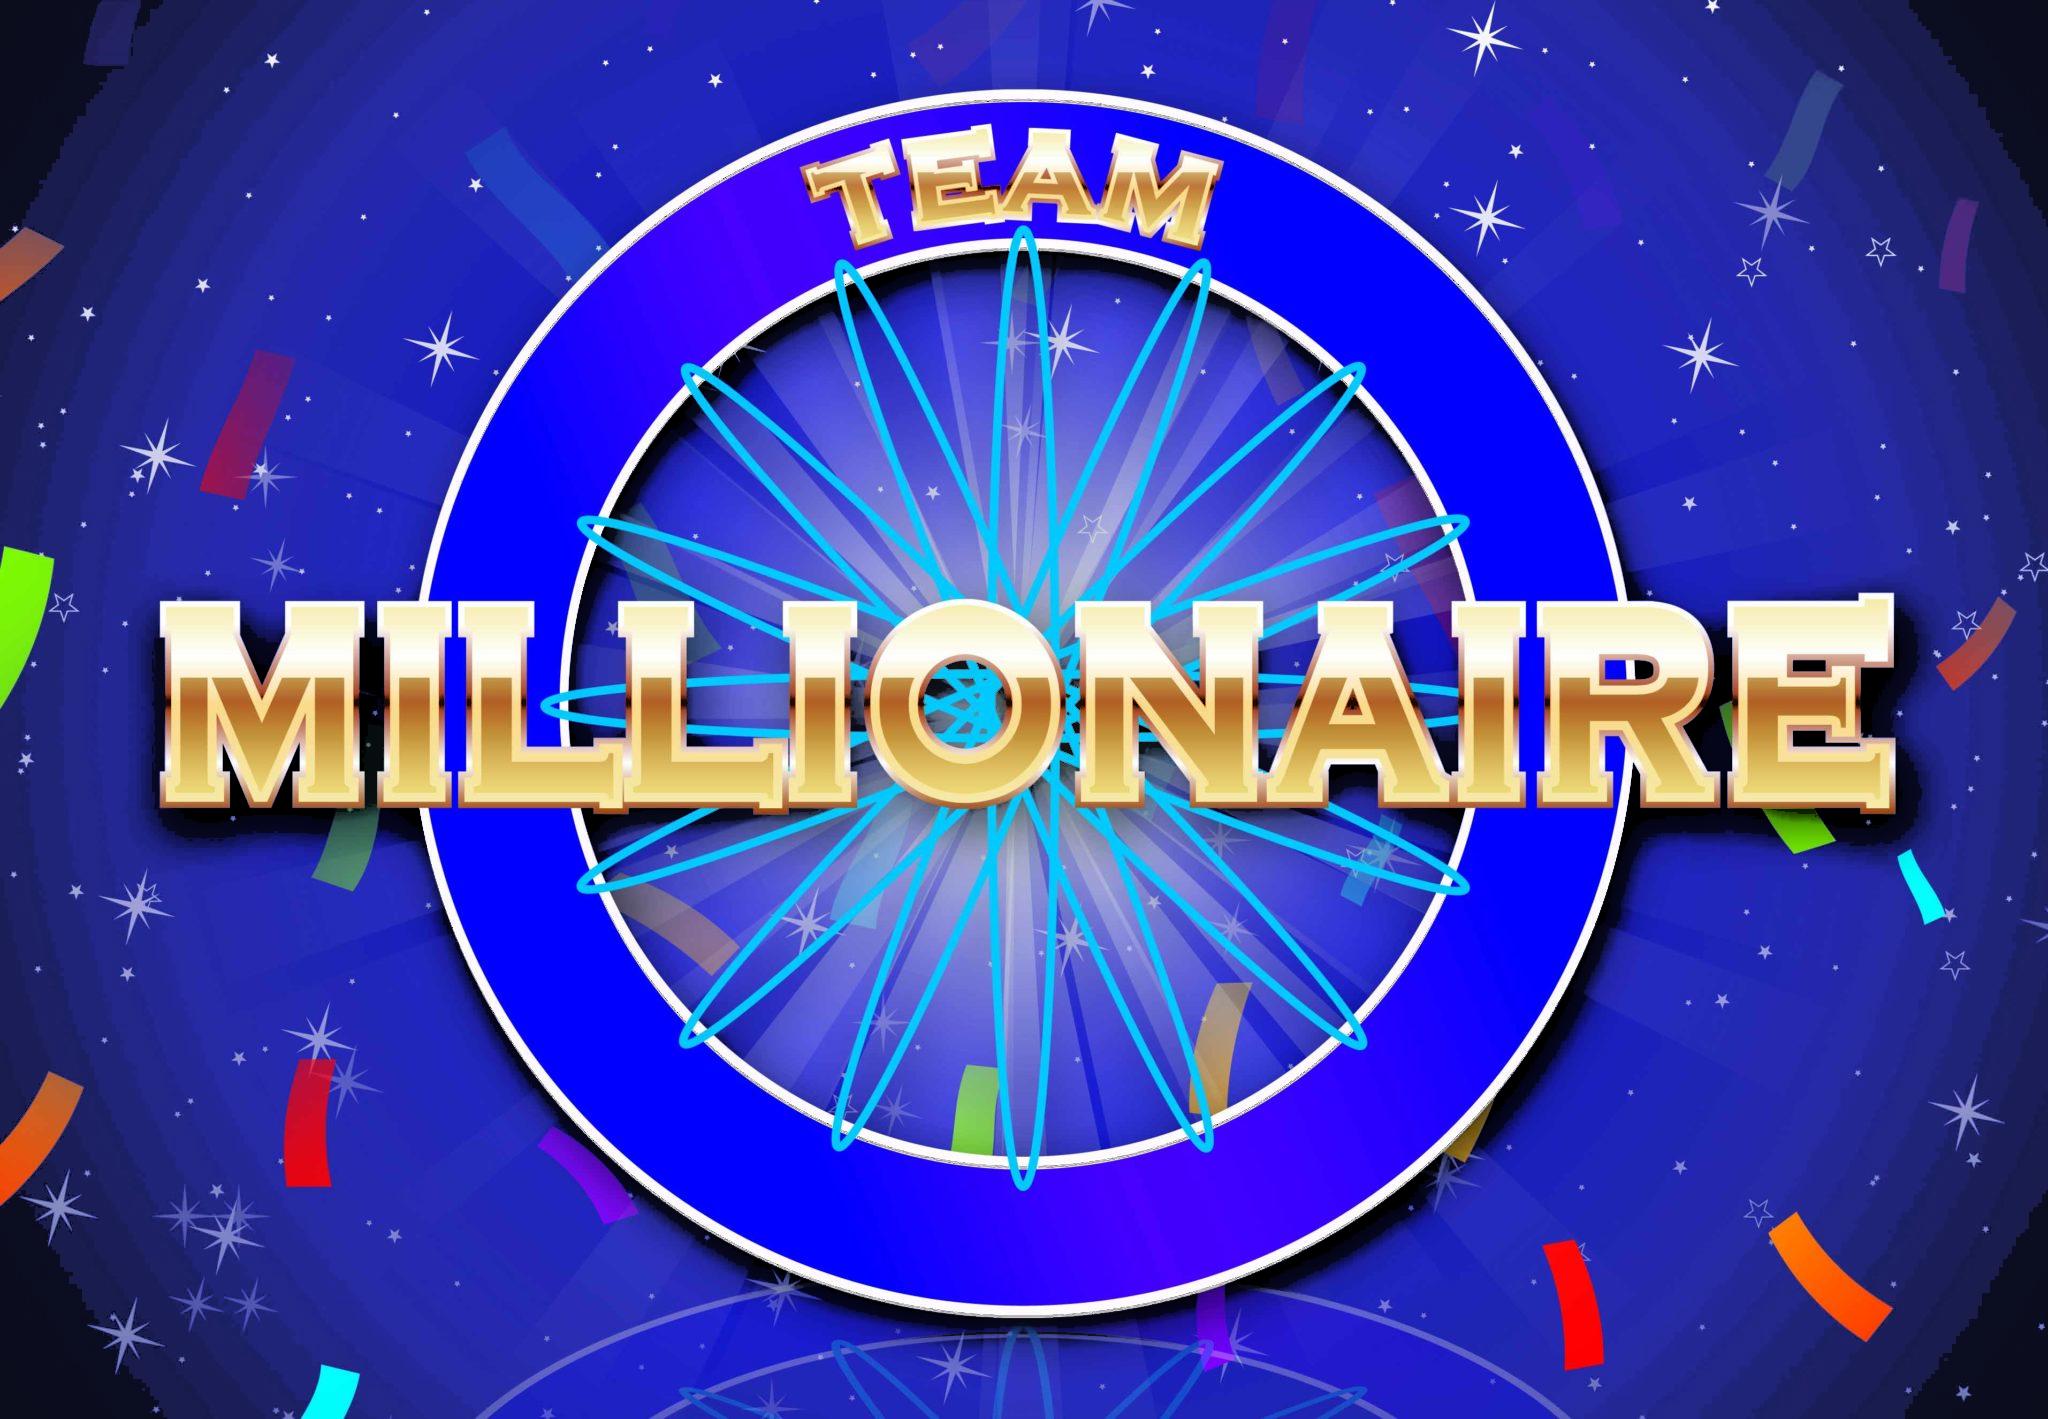 Team Millionaire